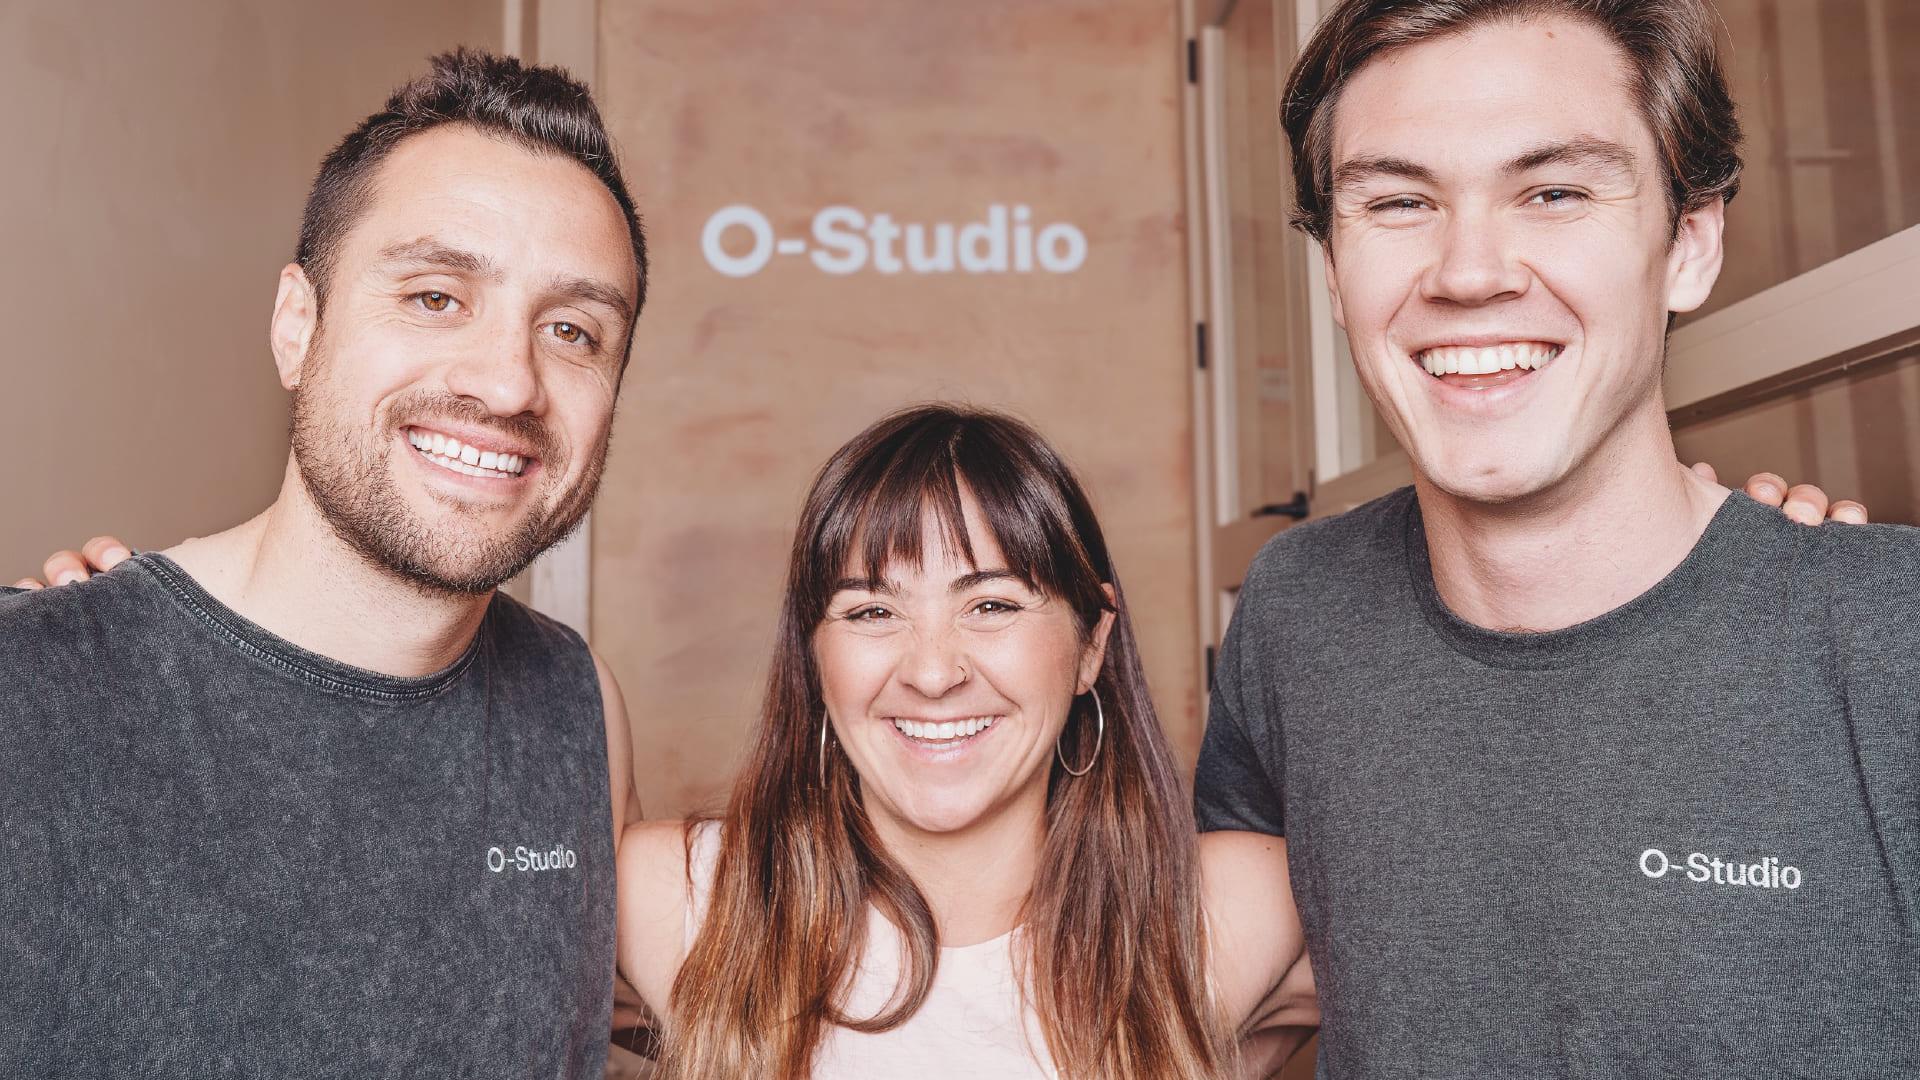 attraction studio o-studio brand the team